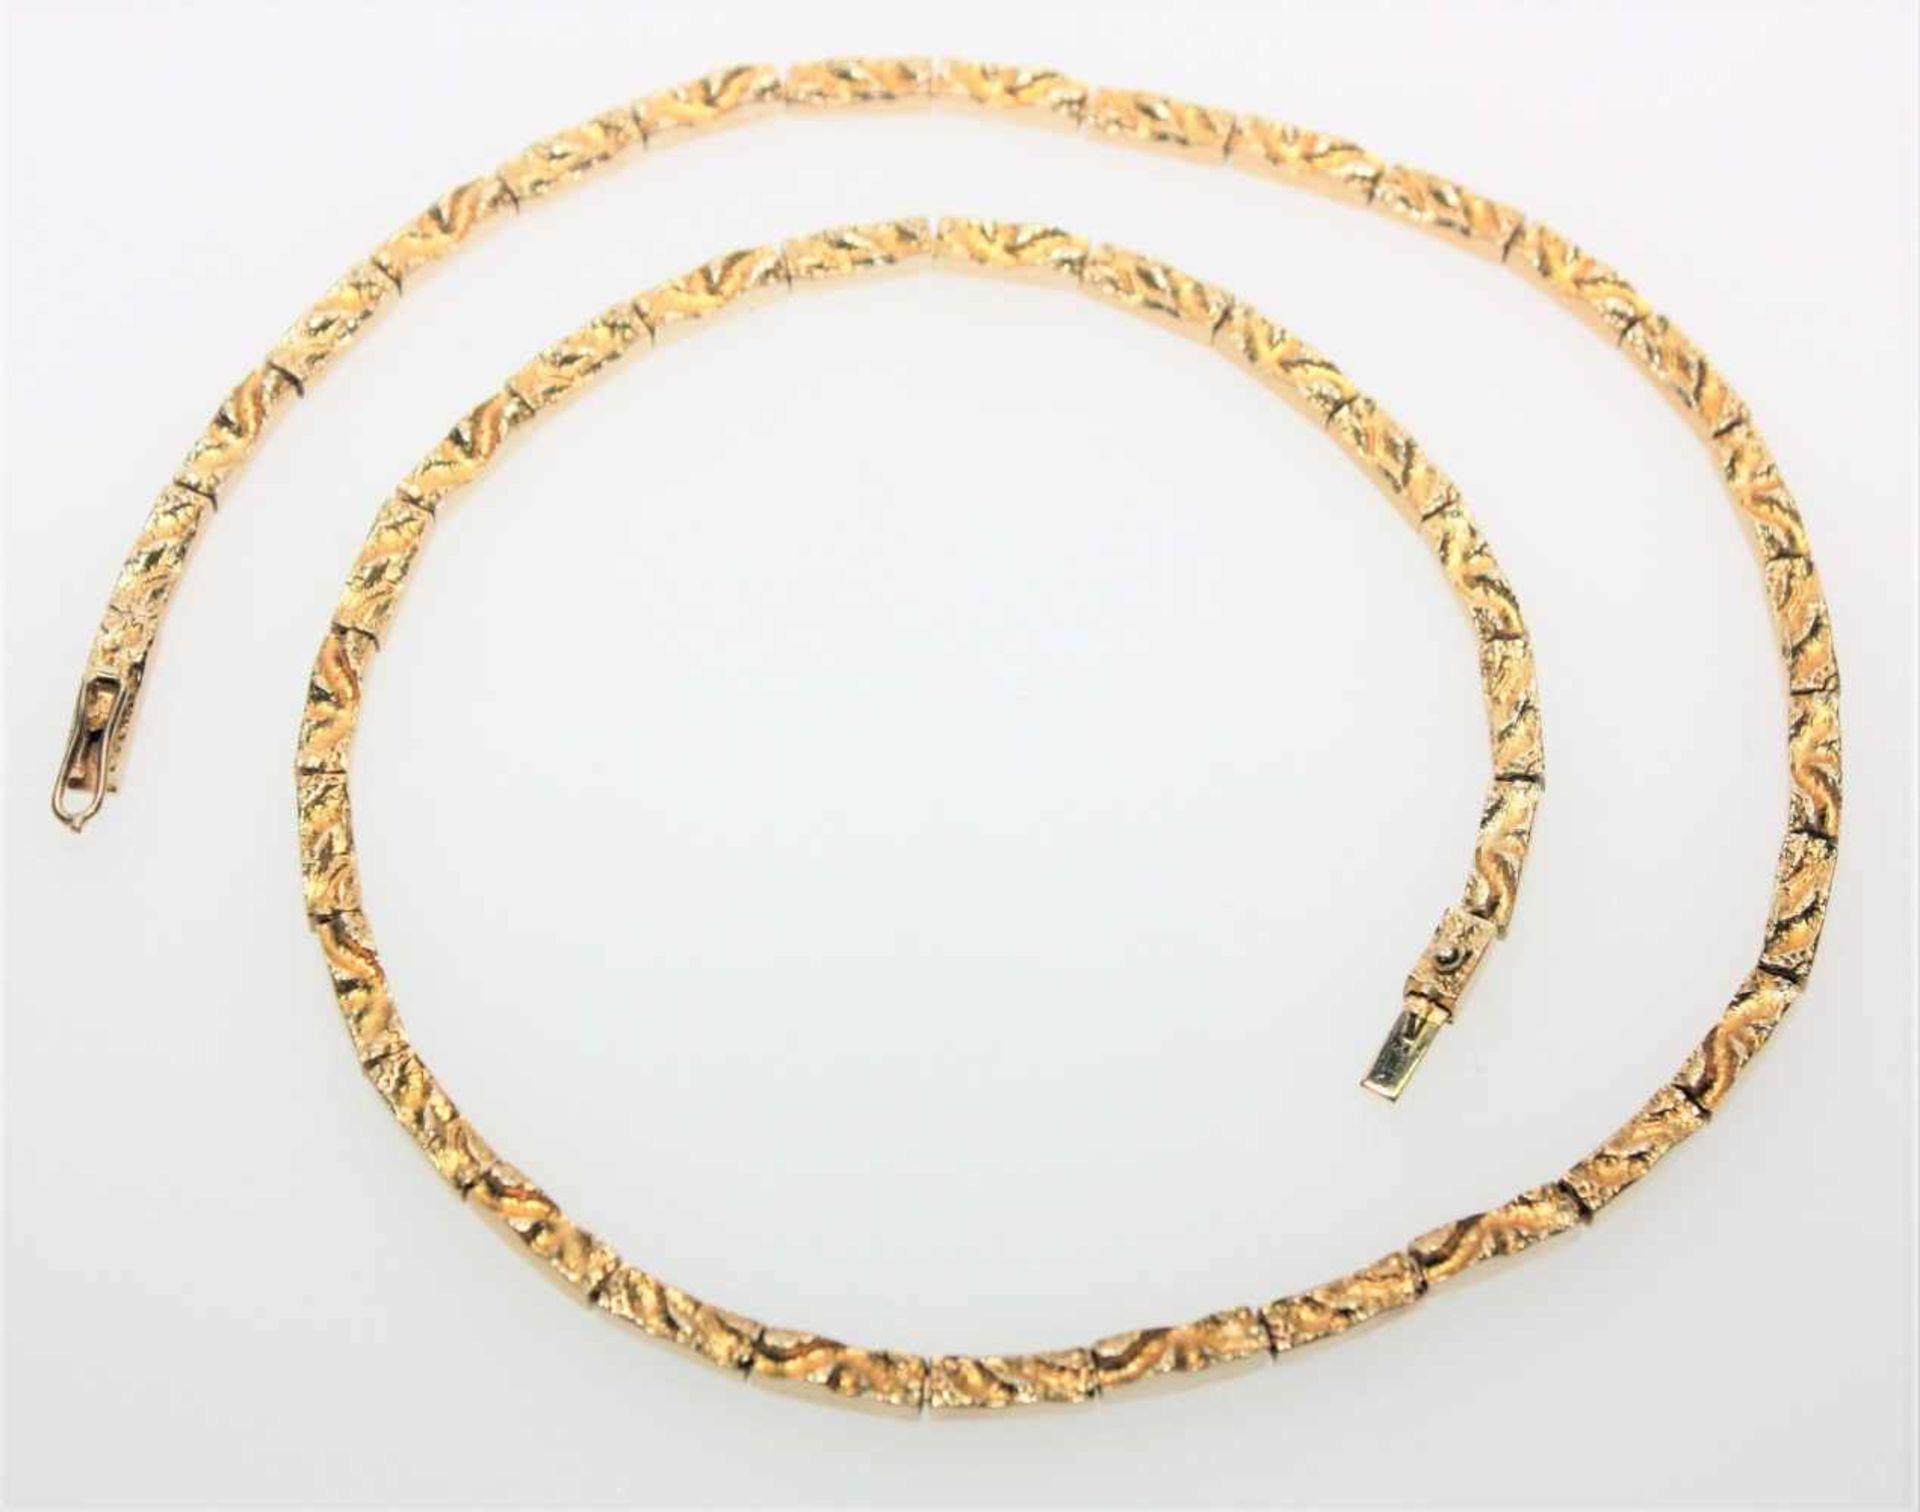 "Schmales, goldenes Gliedercollier 750/f gest. ""Lapponina"" ca. 42 cm lang, neuwertig.Brgw. 33,4 g"